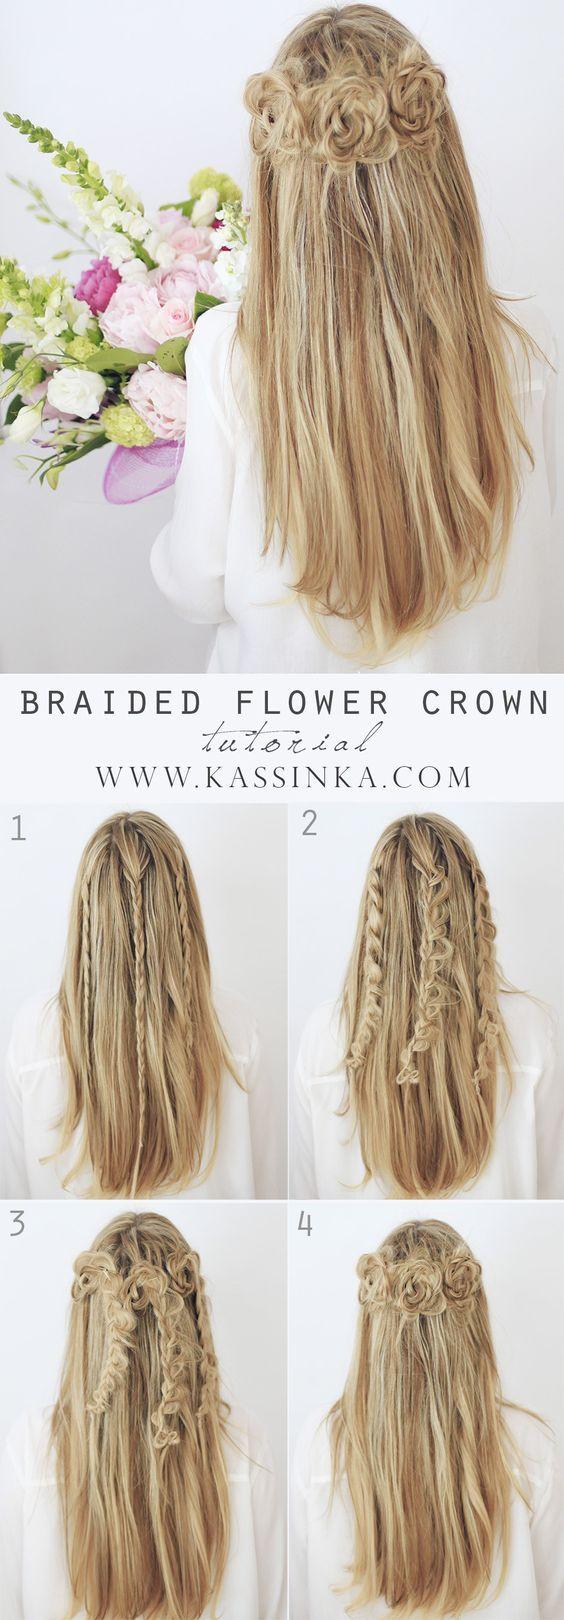 Braided flower crown wedding hair tutorial / http://www.himisspuff.com/easy-diy-braided-hairstyles-tutorials/61/                                                                                                                                                                                 More